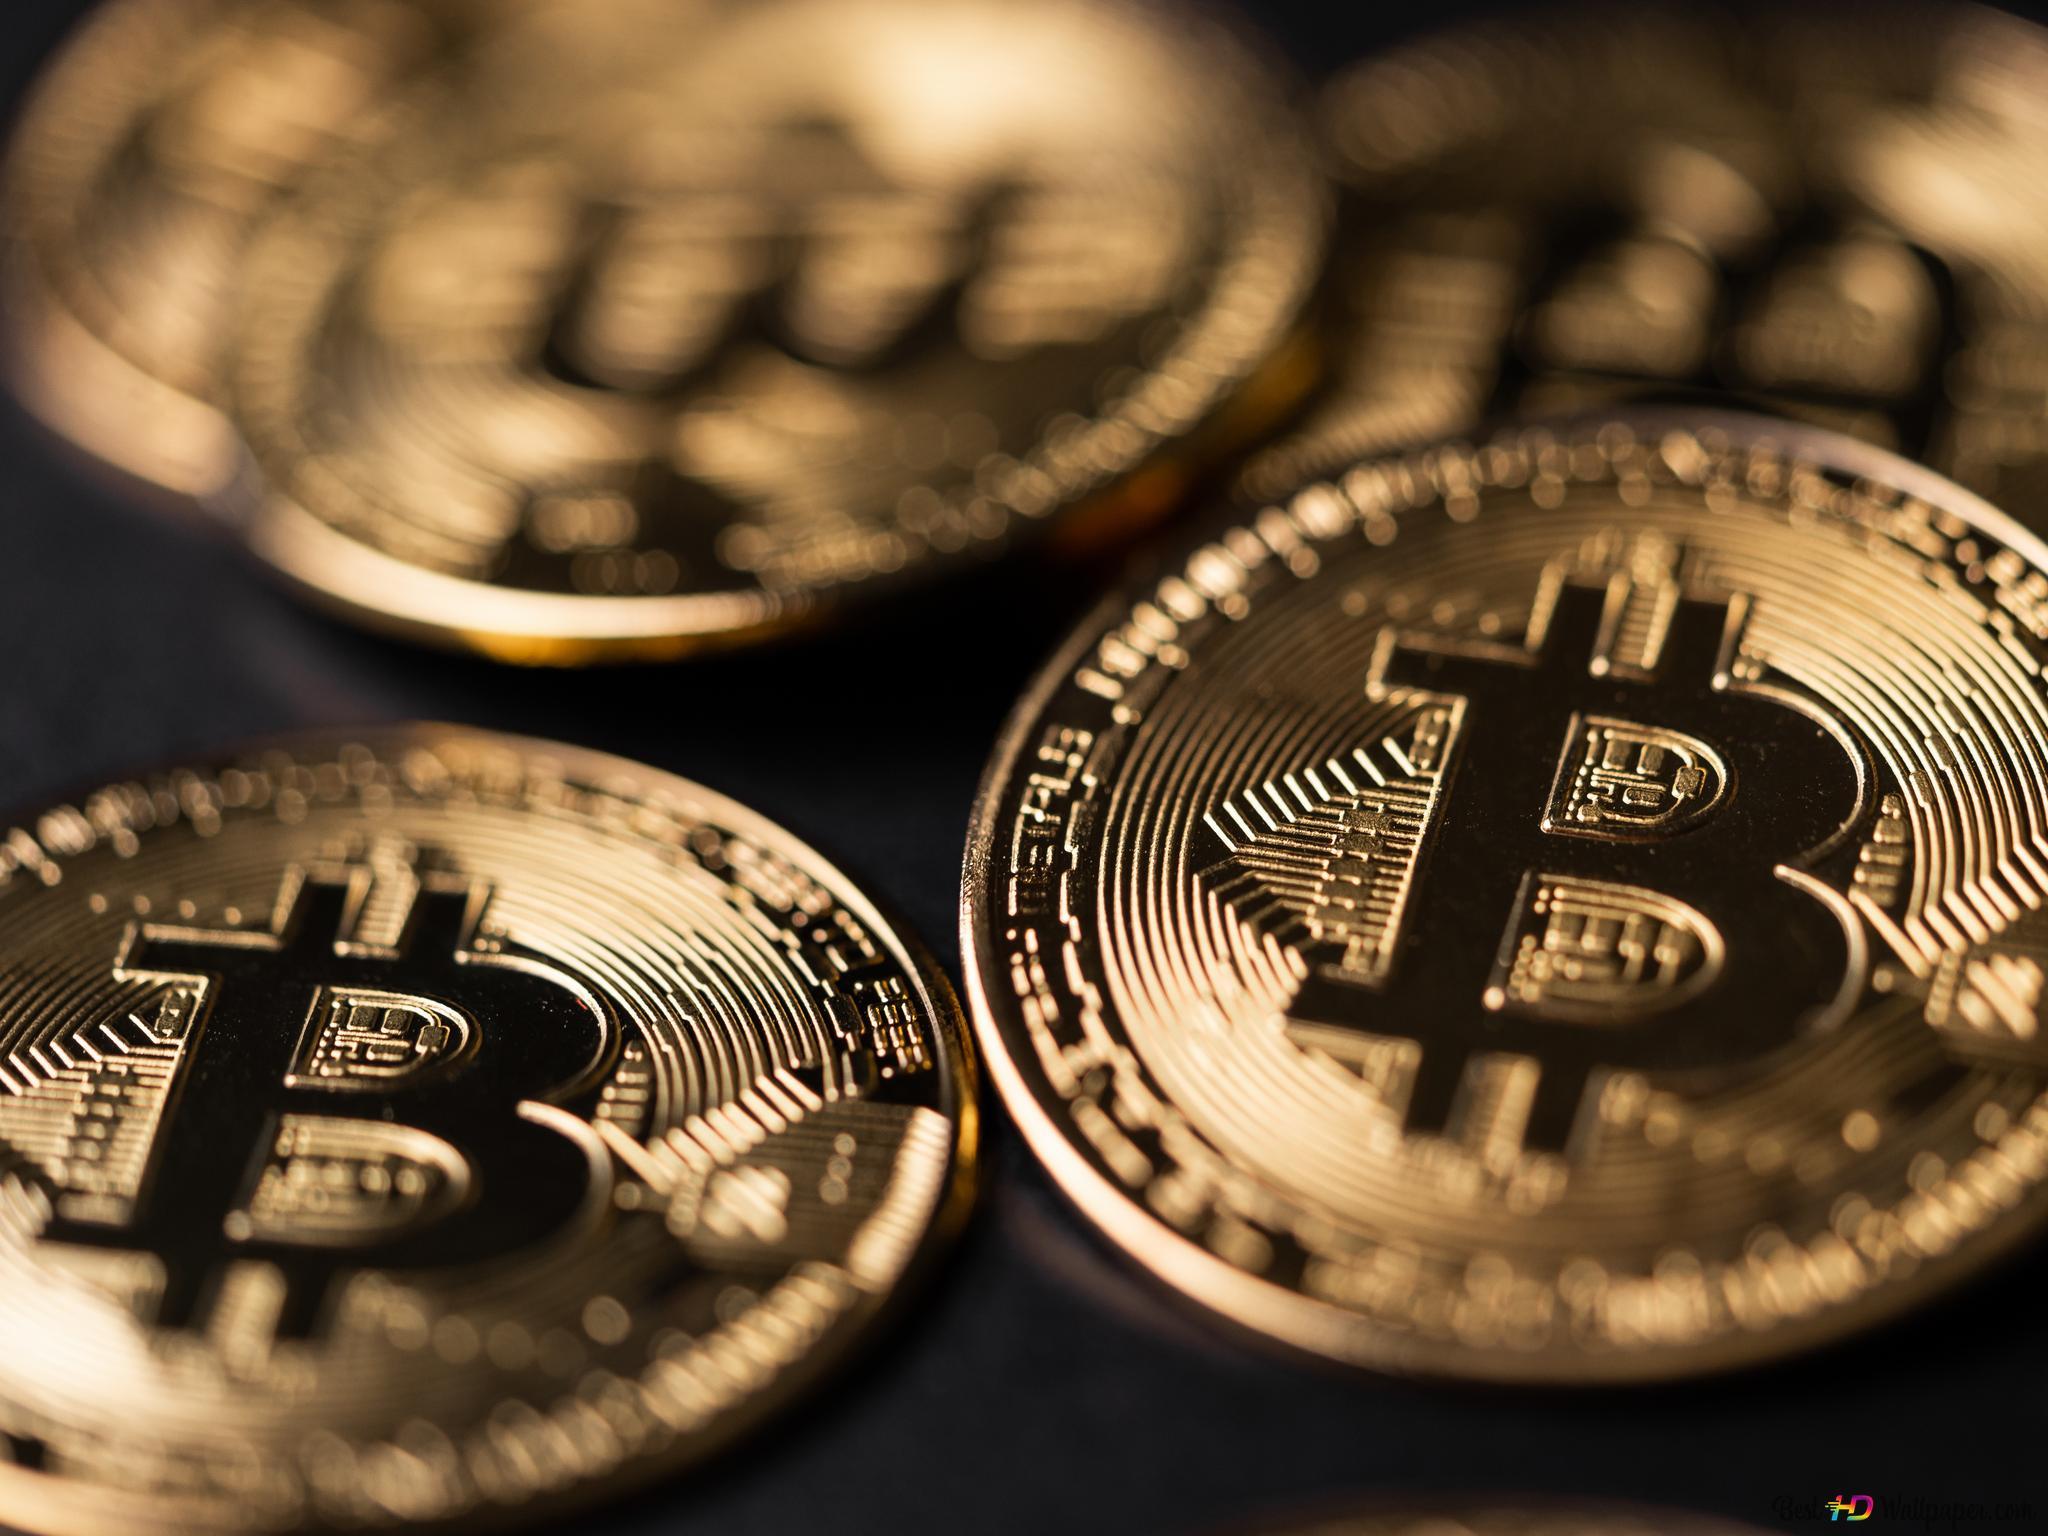 pinigai bitcoin eteris vs bitcoin rinkos dangtelis